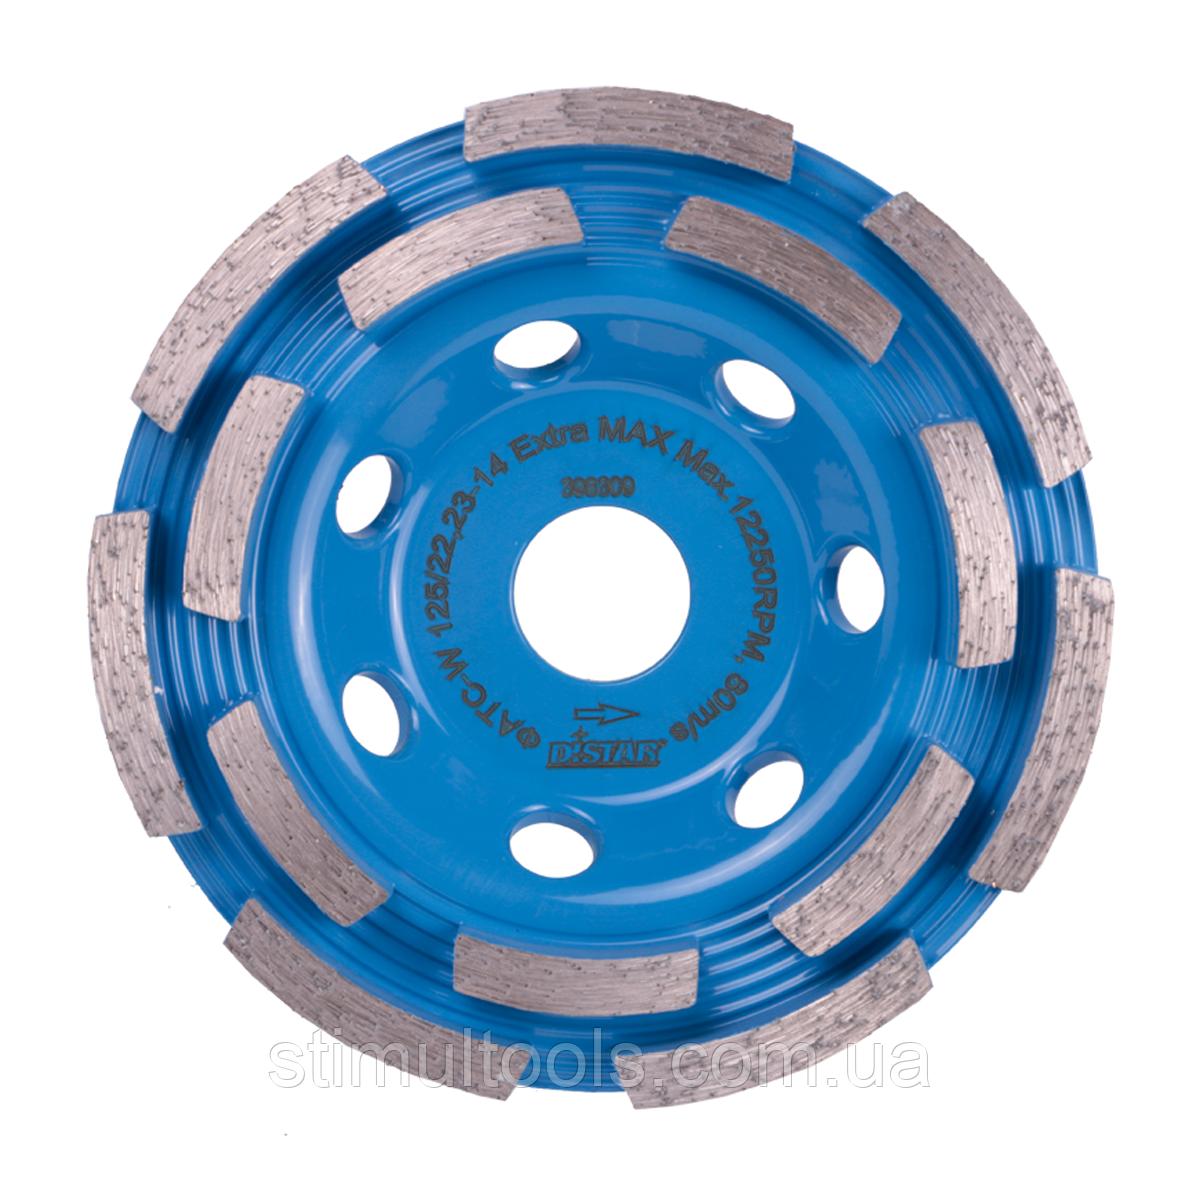 Алмазная фреза Distar DGS-W 150/22,23-16 Extra Max